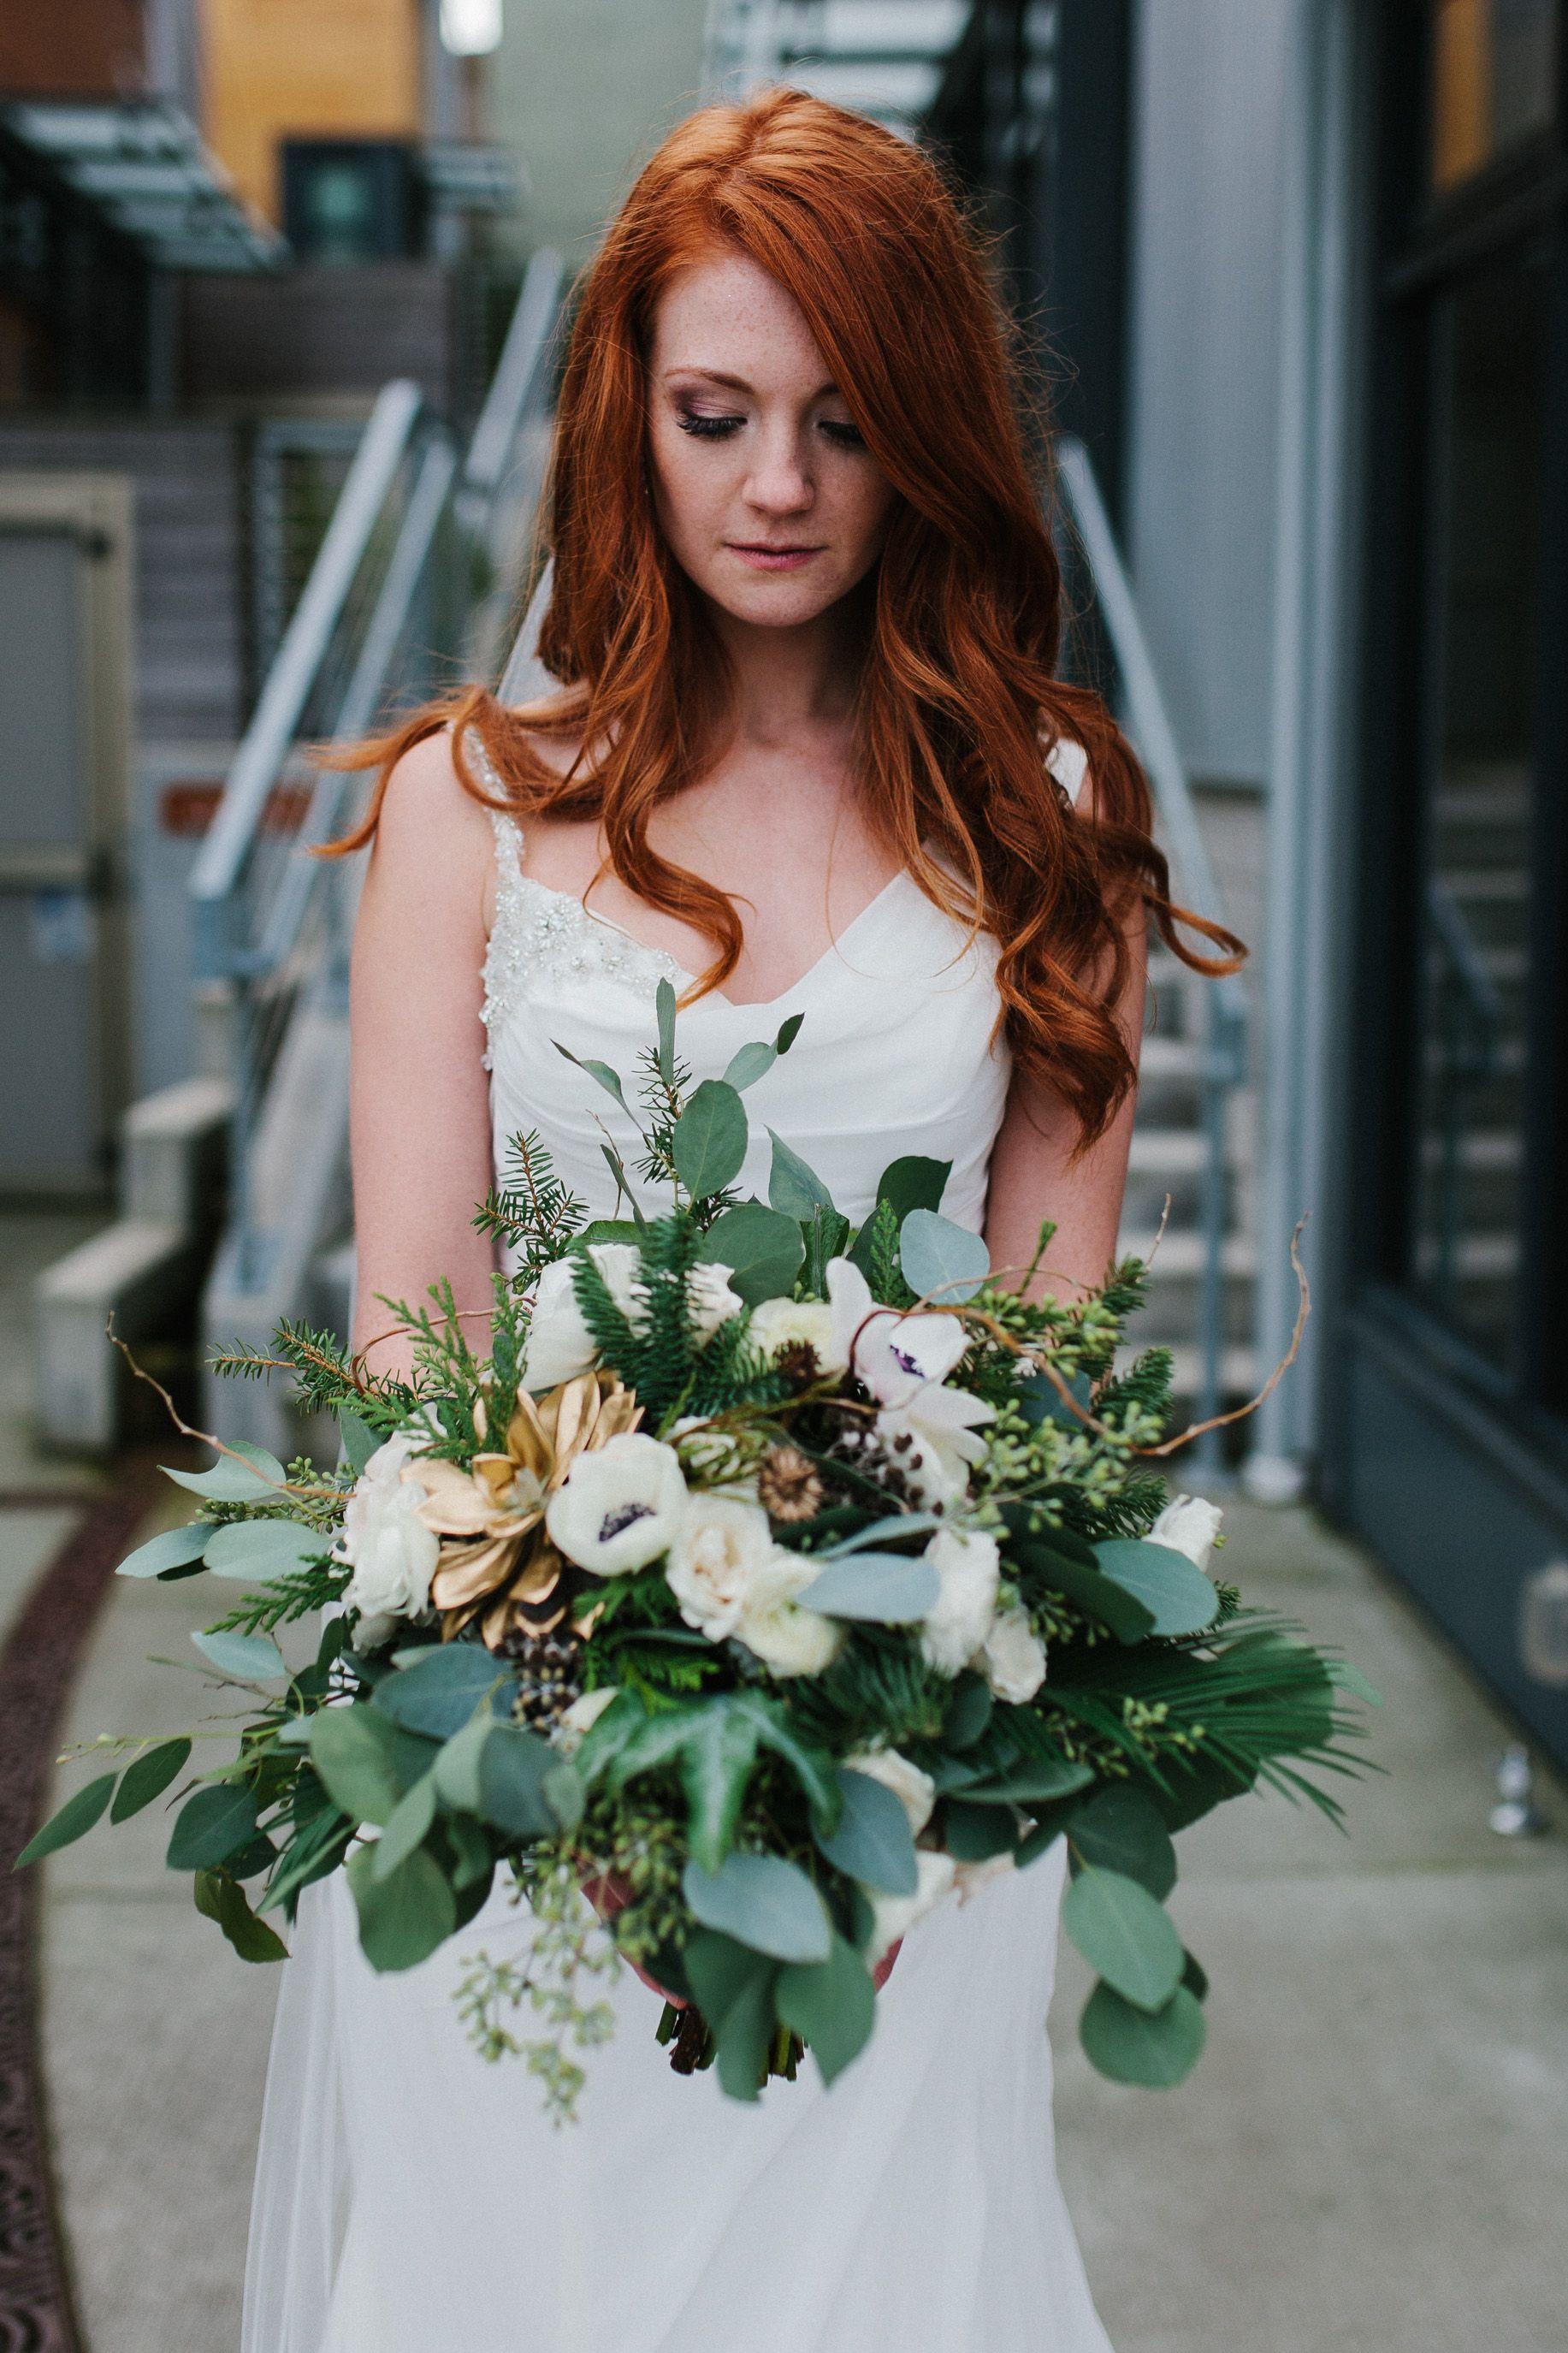 Bridal Makeup for Redheads Redhead makeup